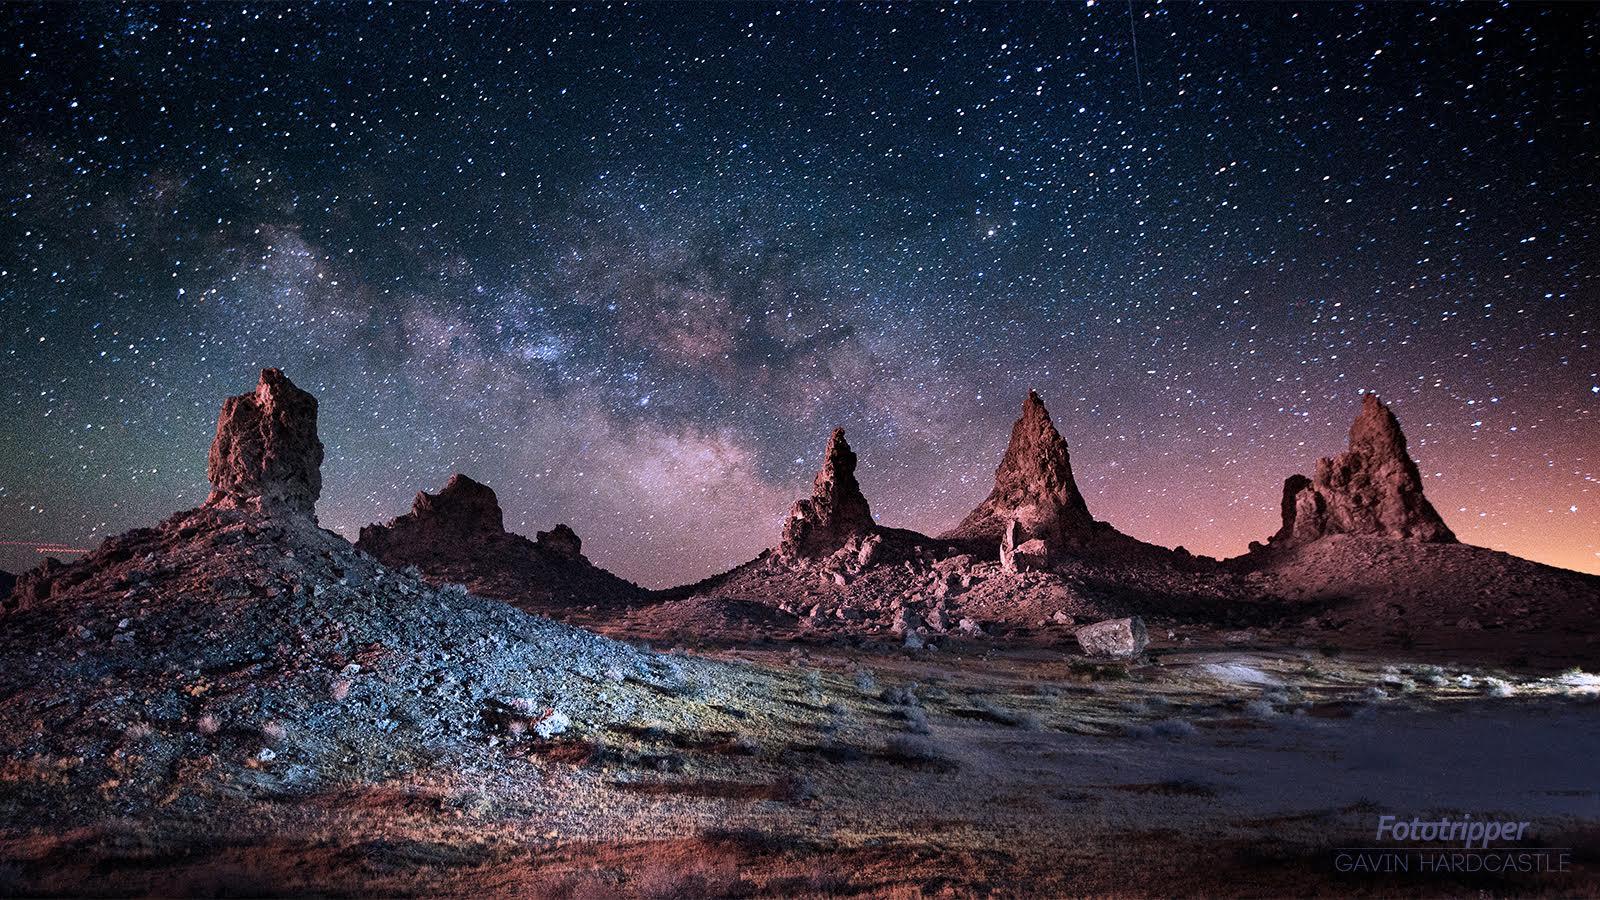 gavin hardcastle astrophotography